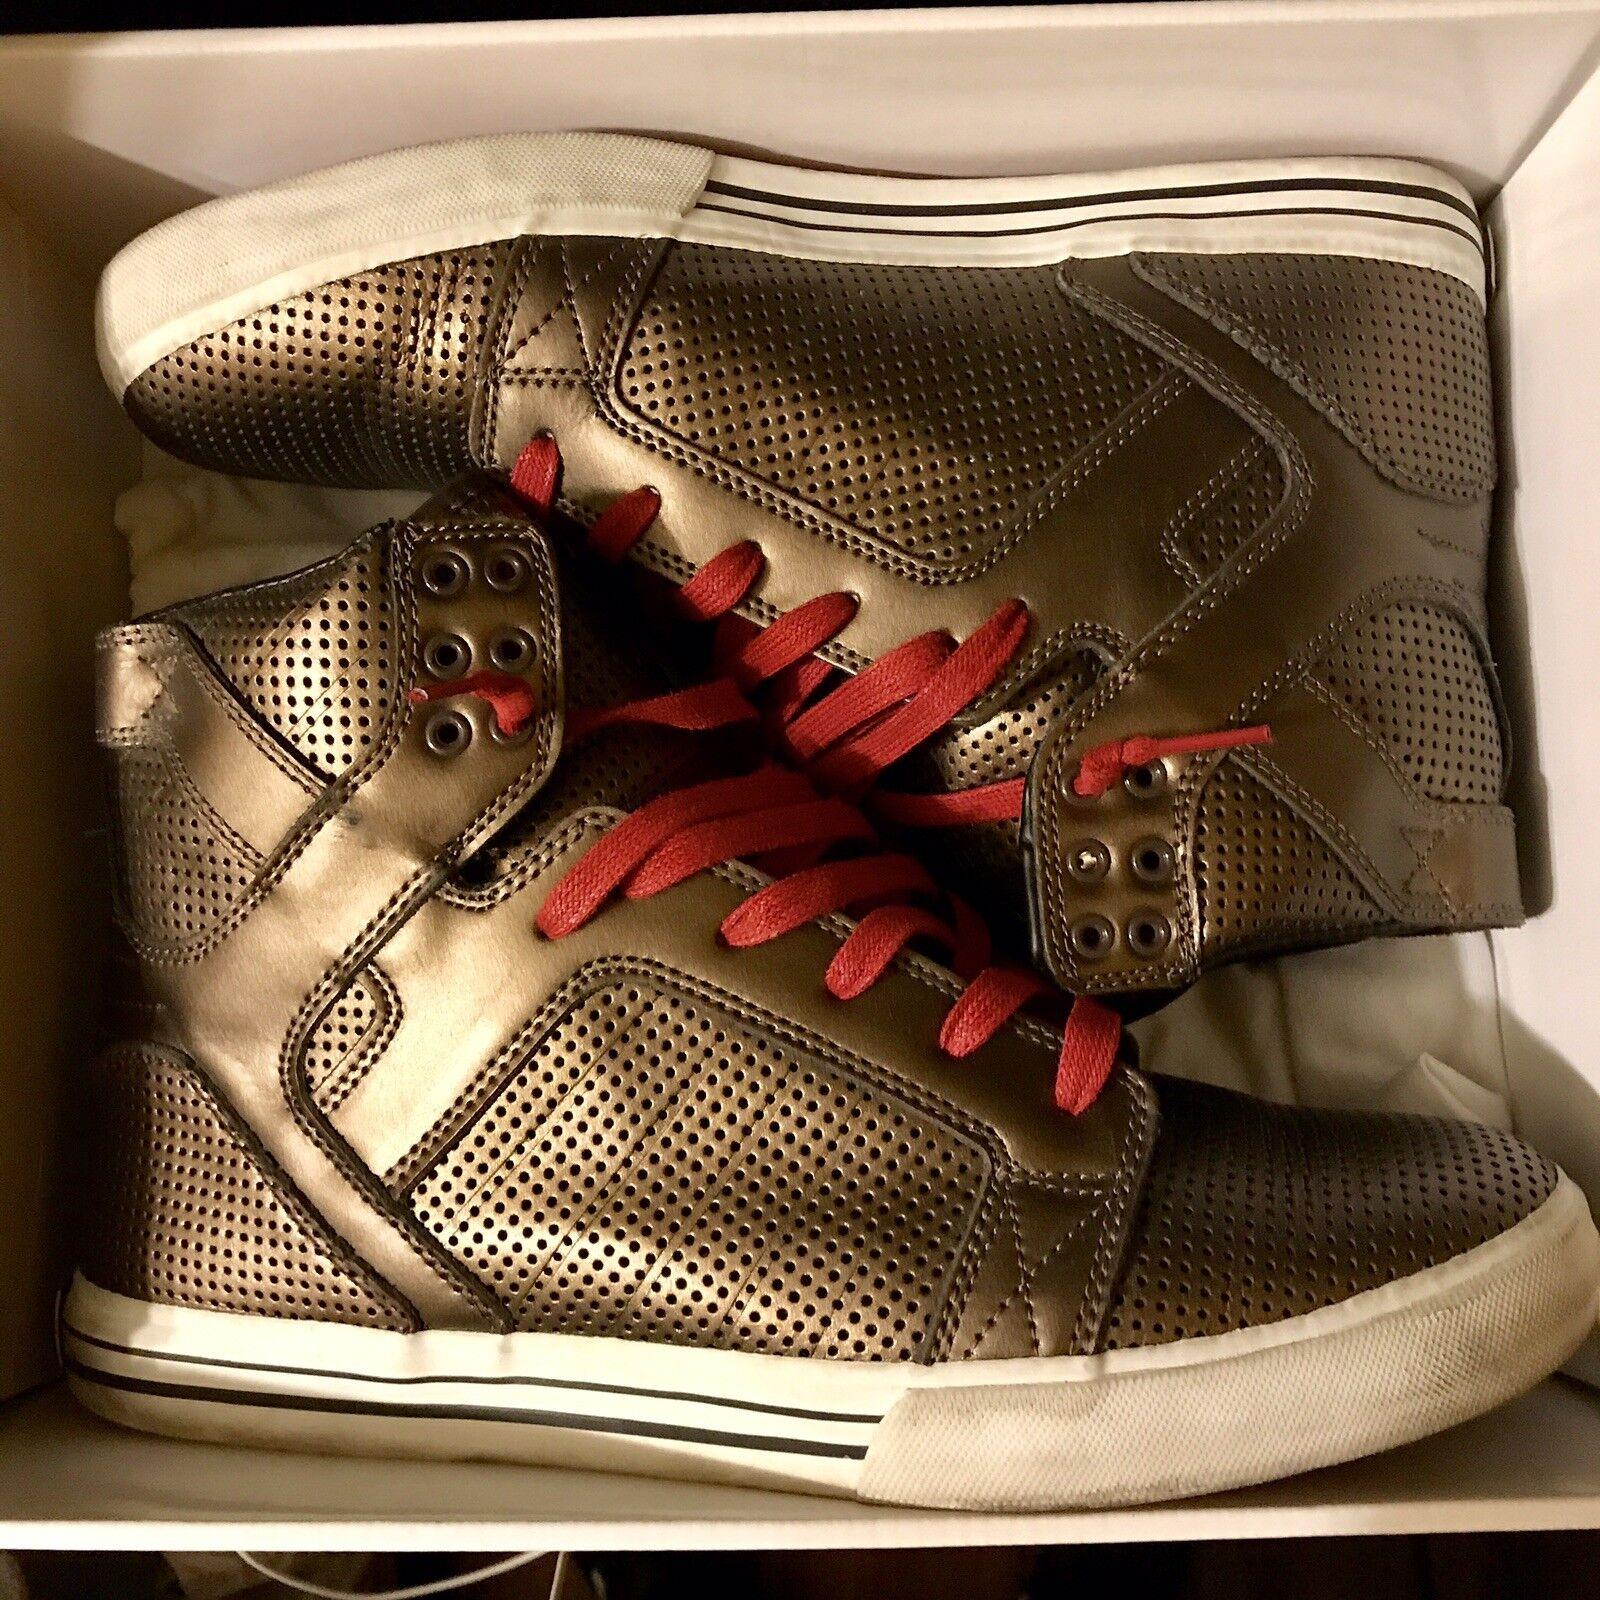 Supra Muska 001 Limited Edition gold OG Skytop Sneakers